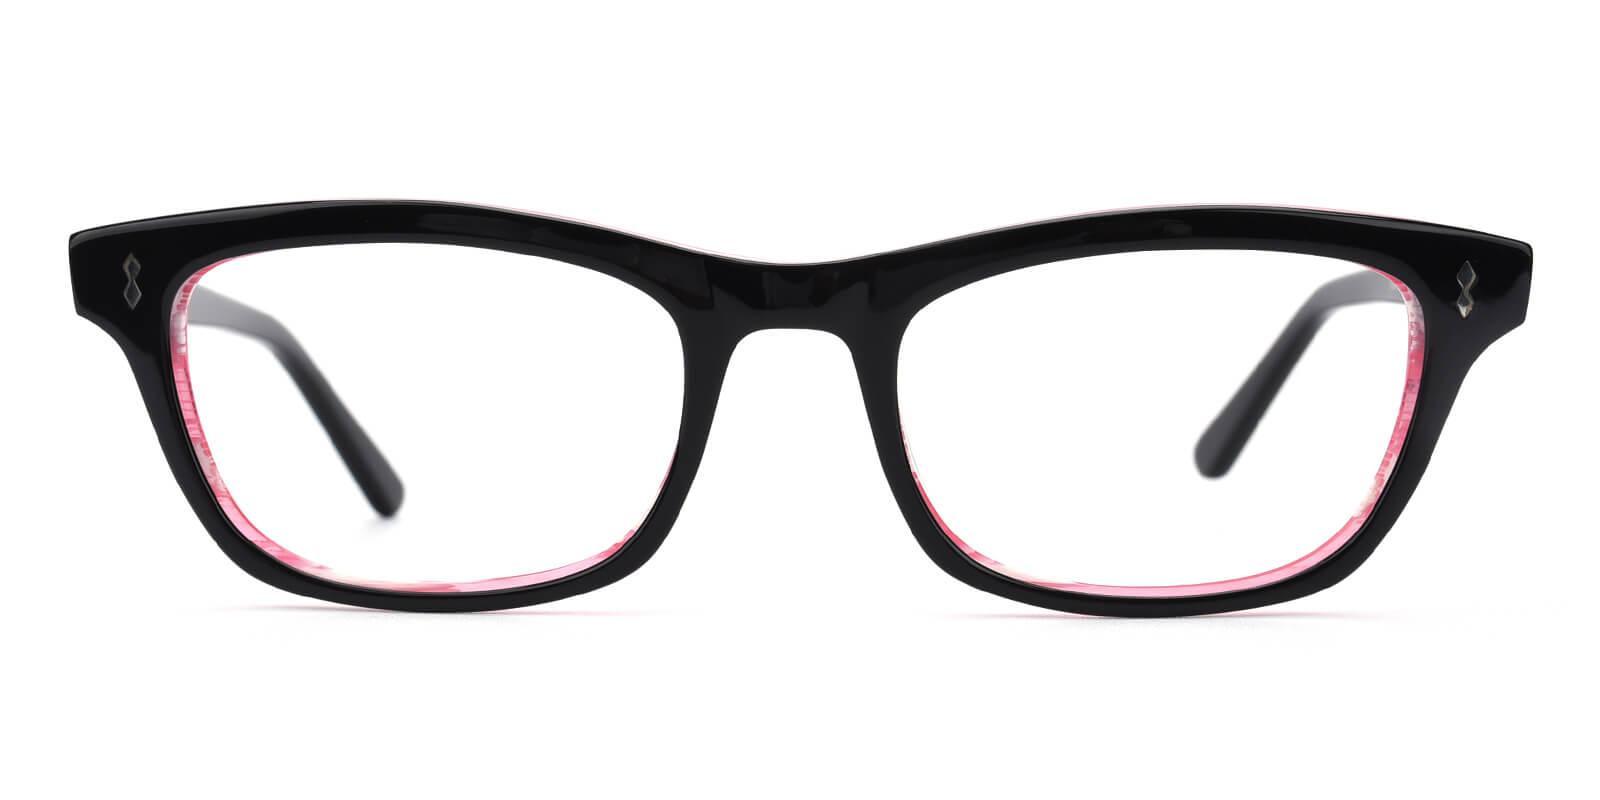 Leavary-Pink-Rectangle-Acetate-Eyeglasses-additional2